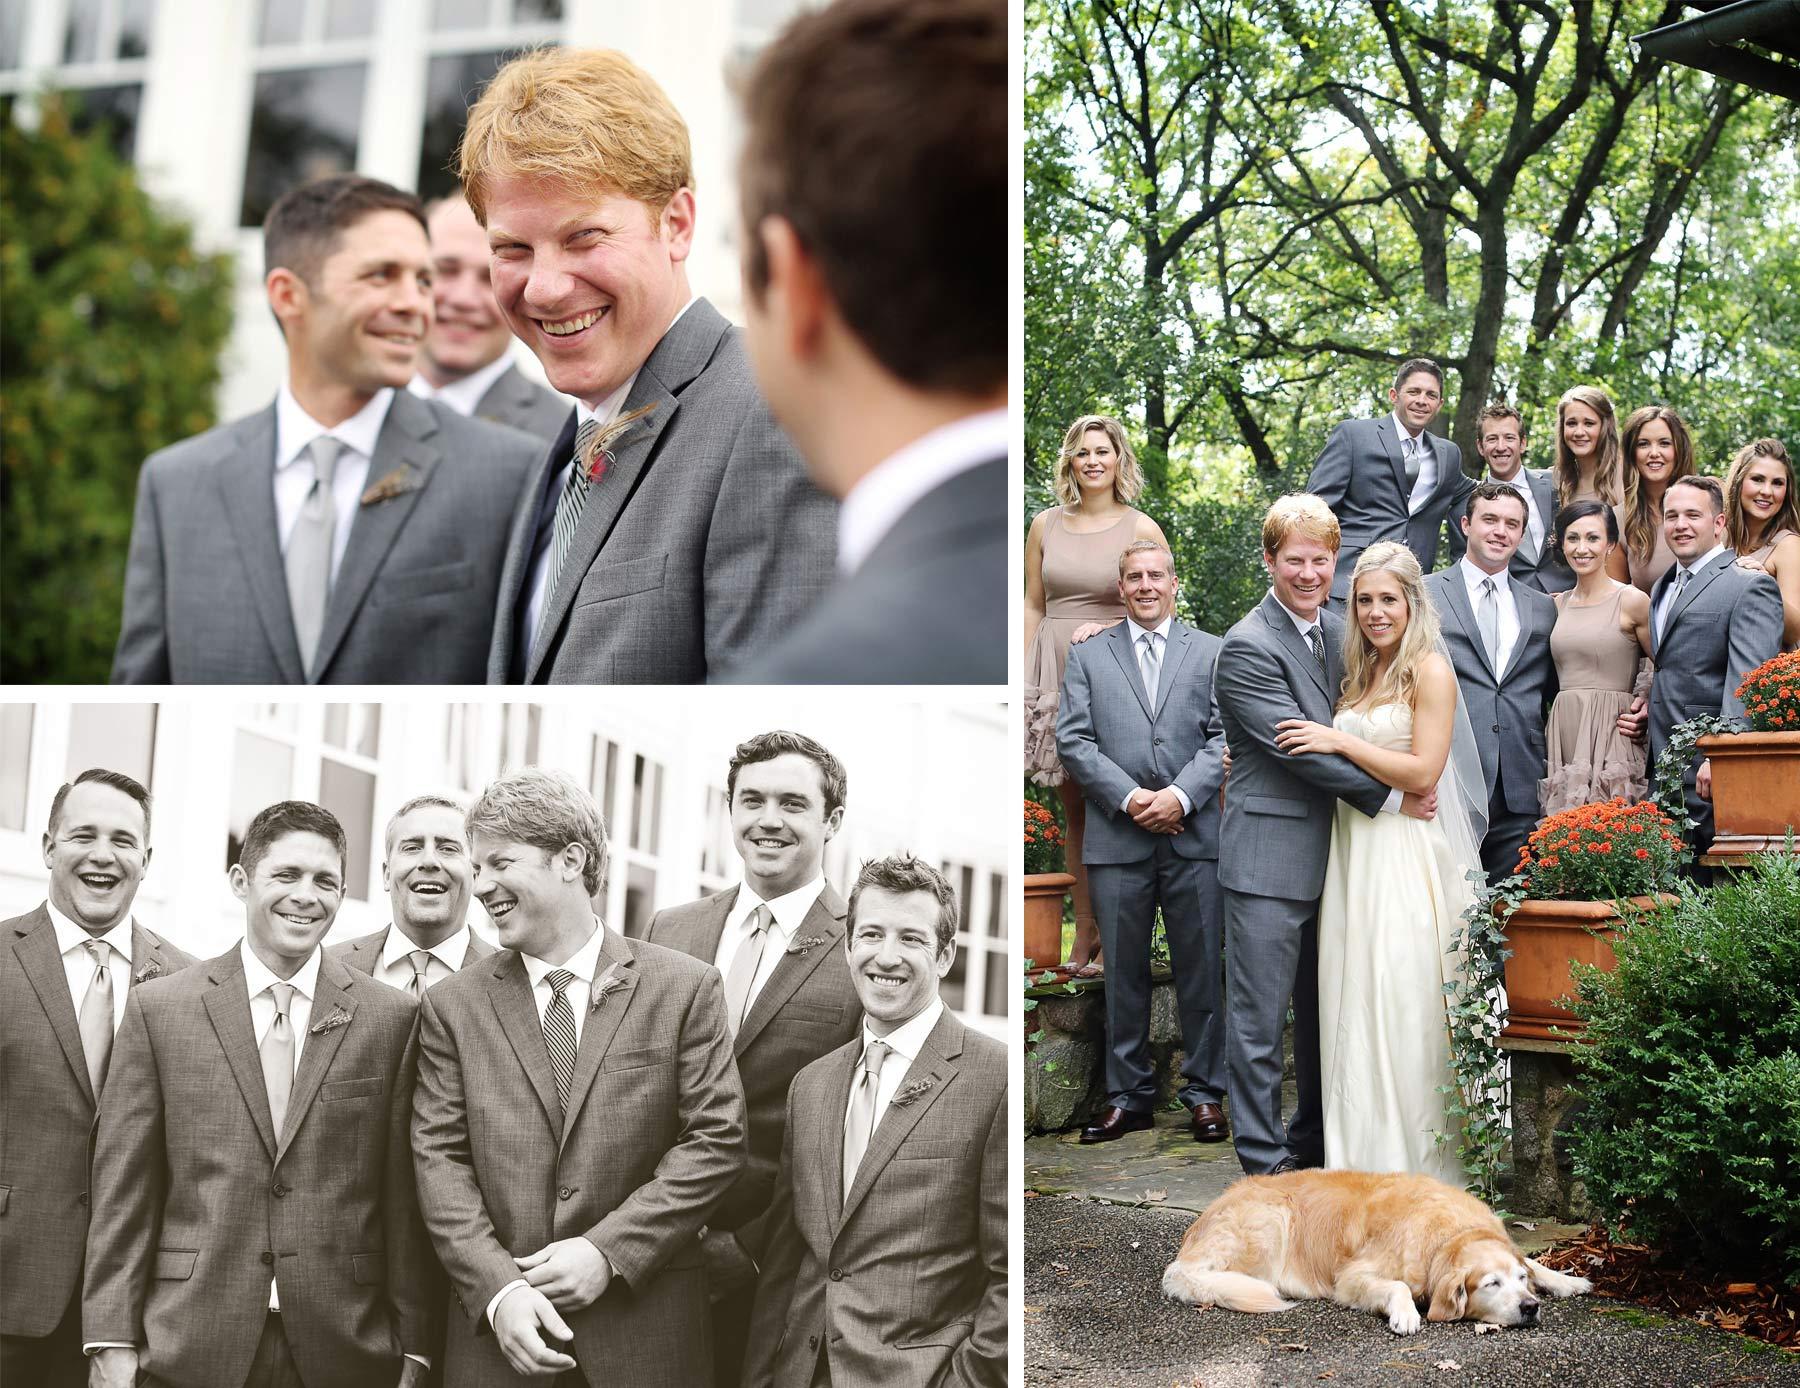 10-Minneapolis-Minnesota-Wedding-Photographer-by-Andrew-Vick-Photography-Fall-Autumn-Parents-House-Bride-Groom-Groomsmen-Bridesmaids-Bridal-Party-Dog-Minikahda-Club-Sepia-Krissy-and-James.jpg